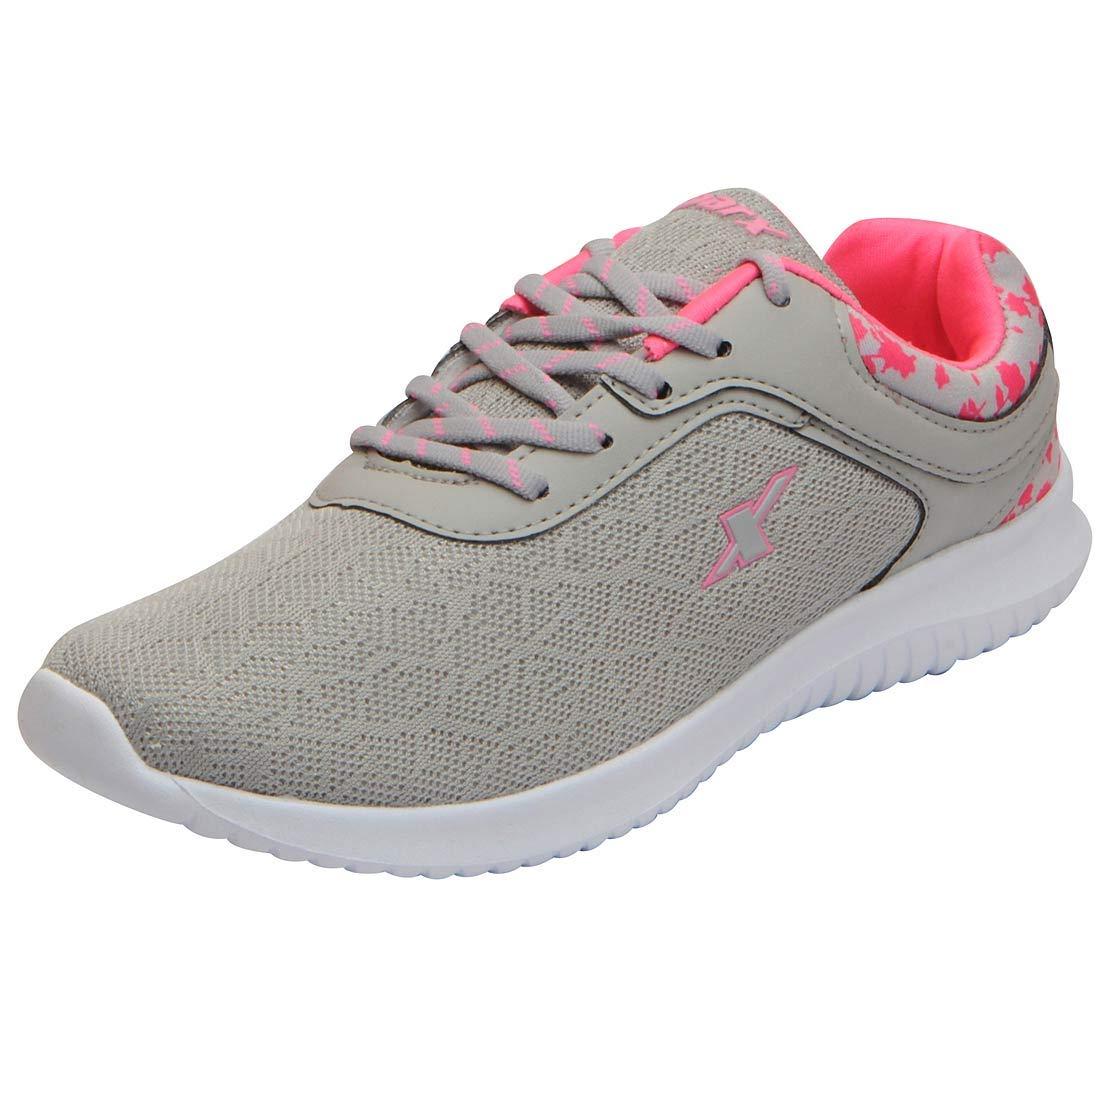 Sparx Women's Grey Pink Running Shoes